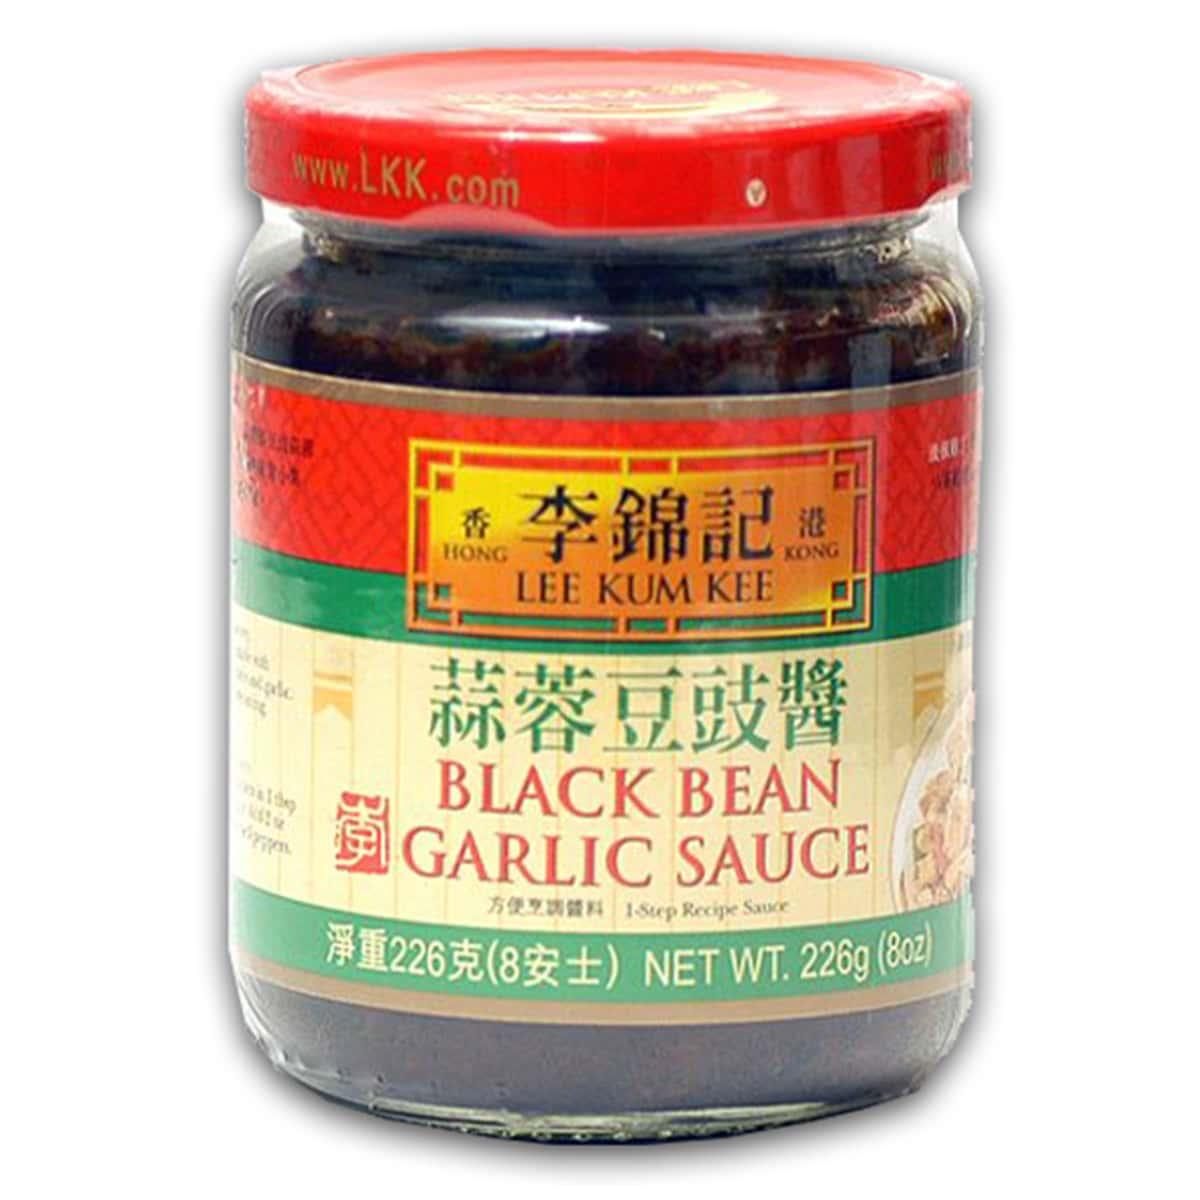 Black Bean Garlic Sauce - 226 gm